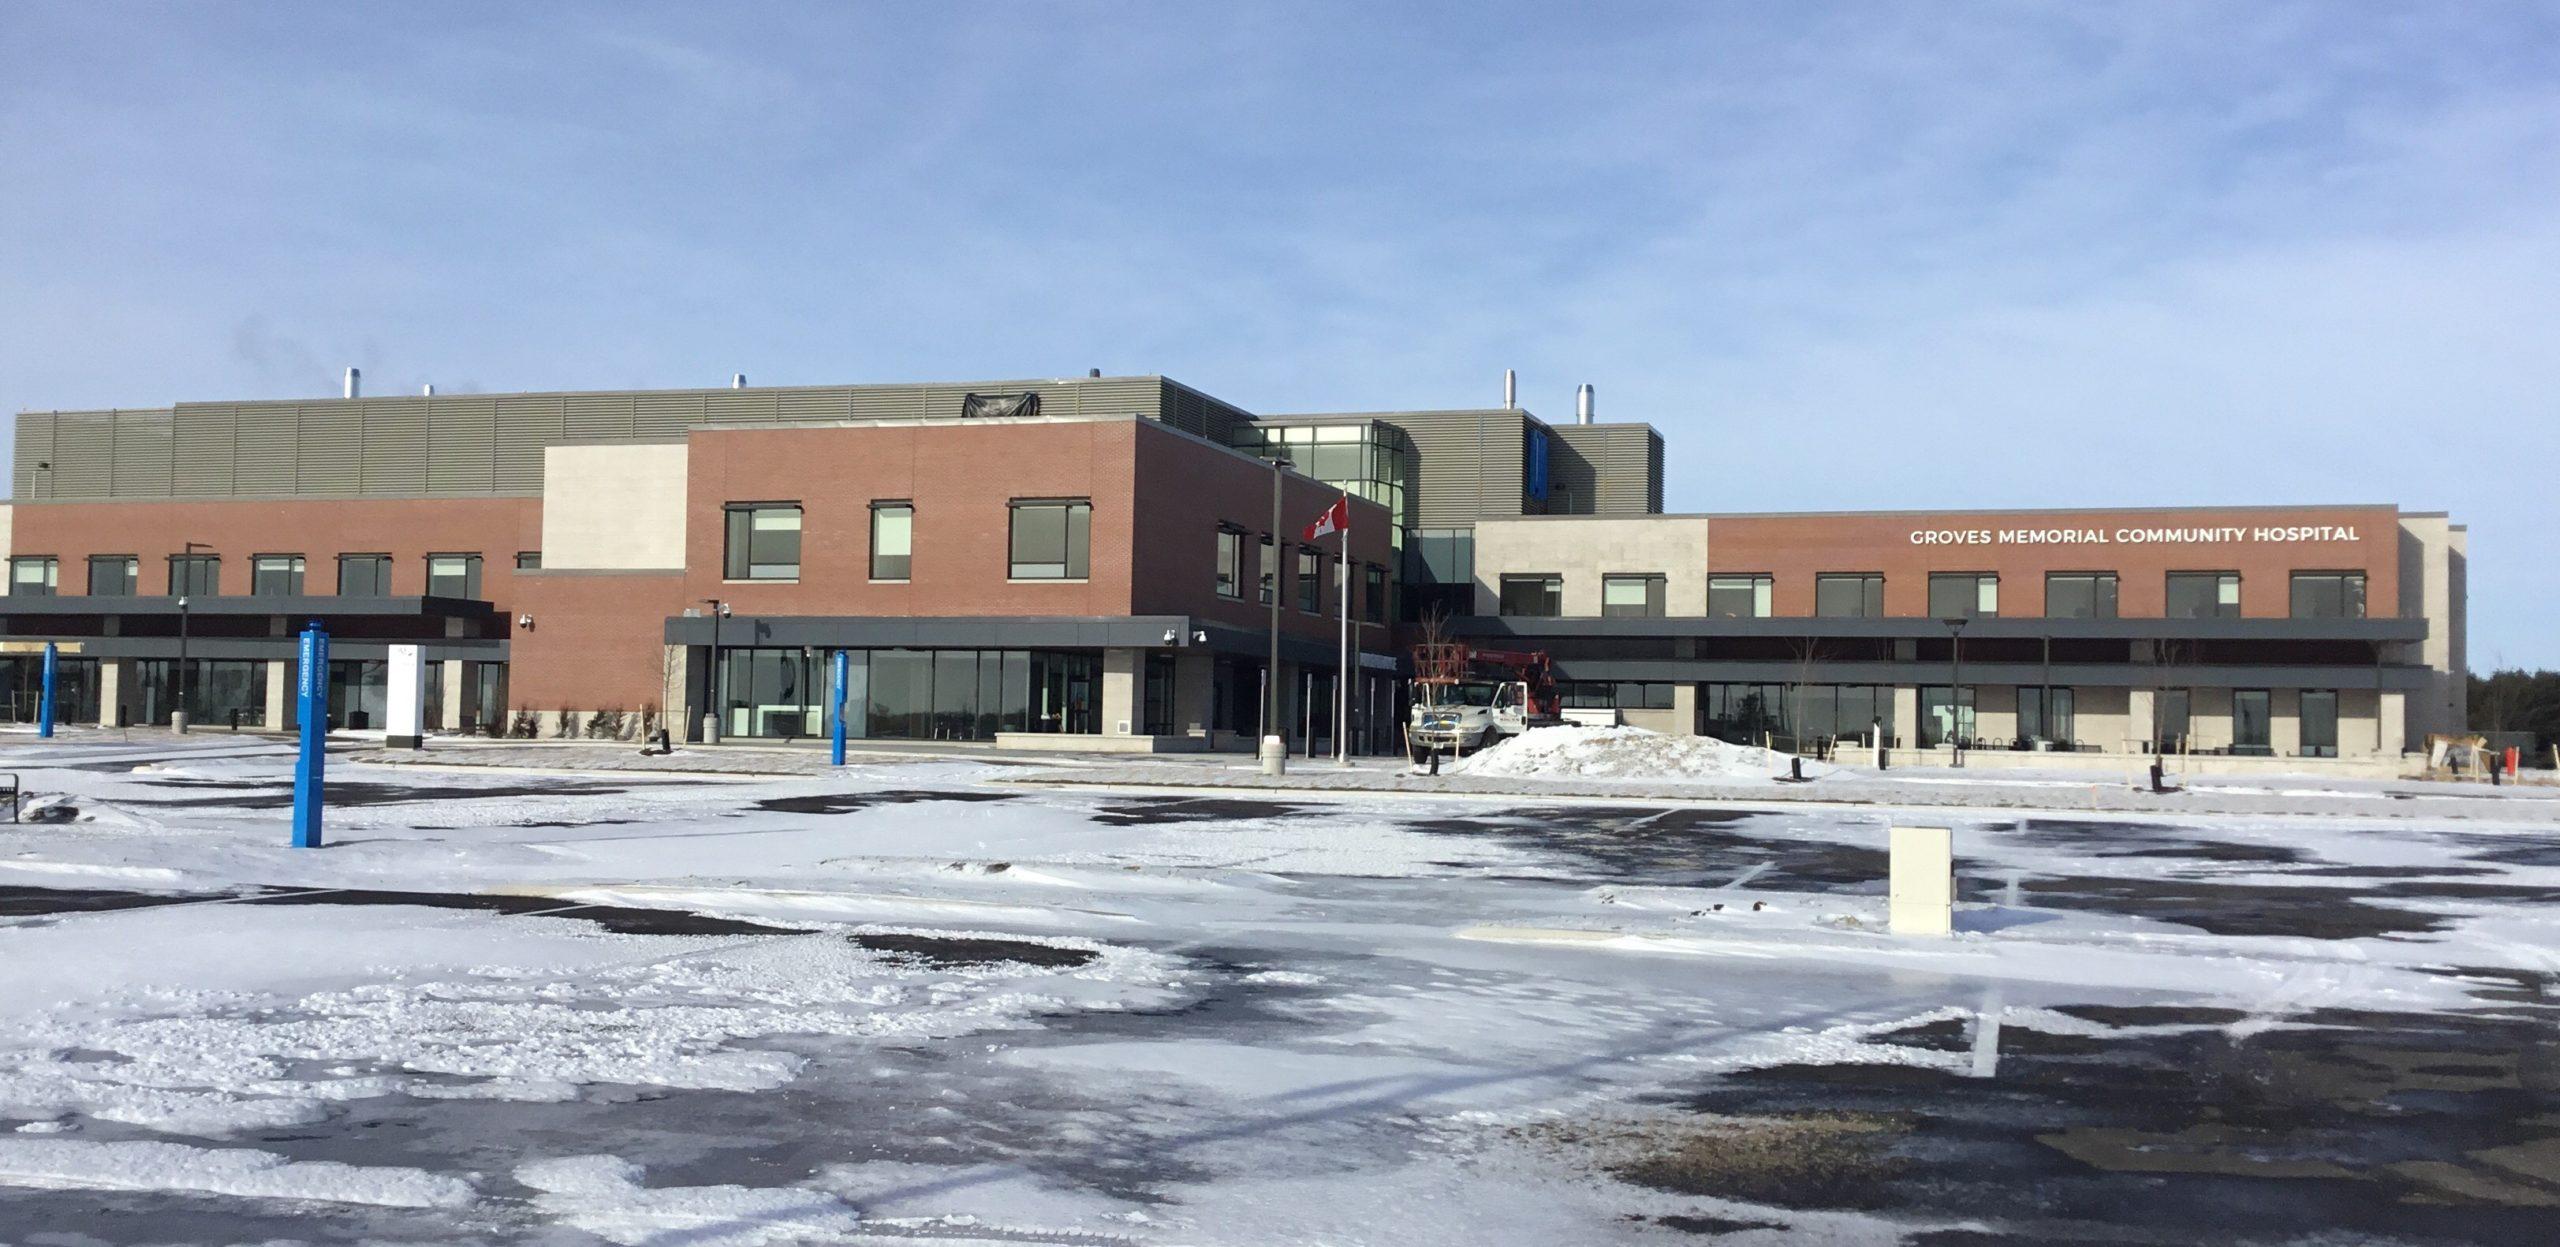 Groves Memorial Community Hospital